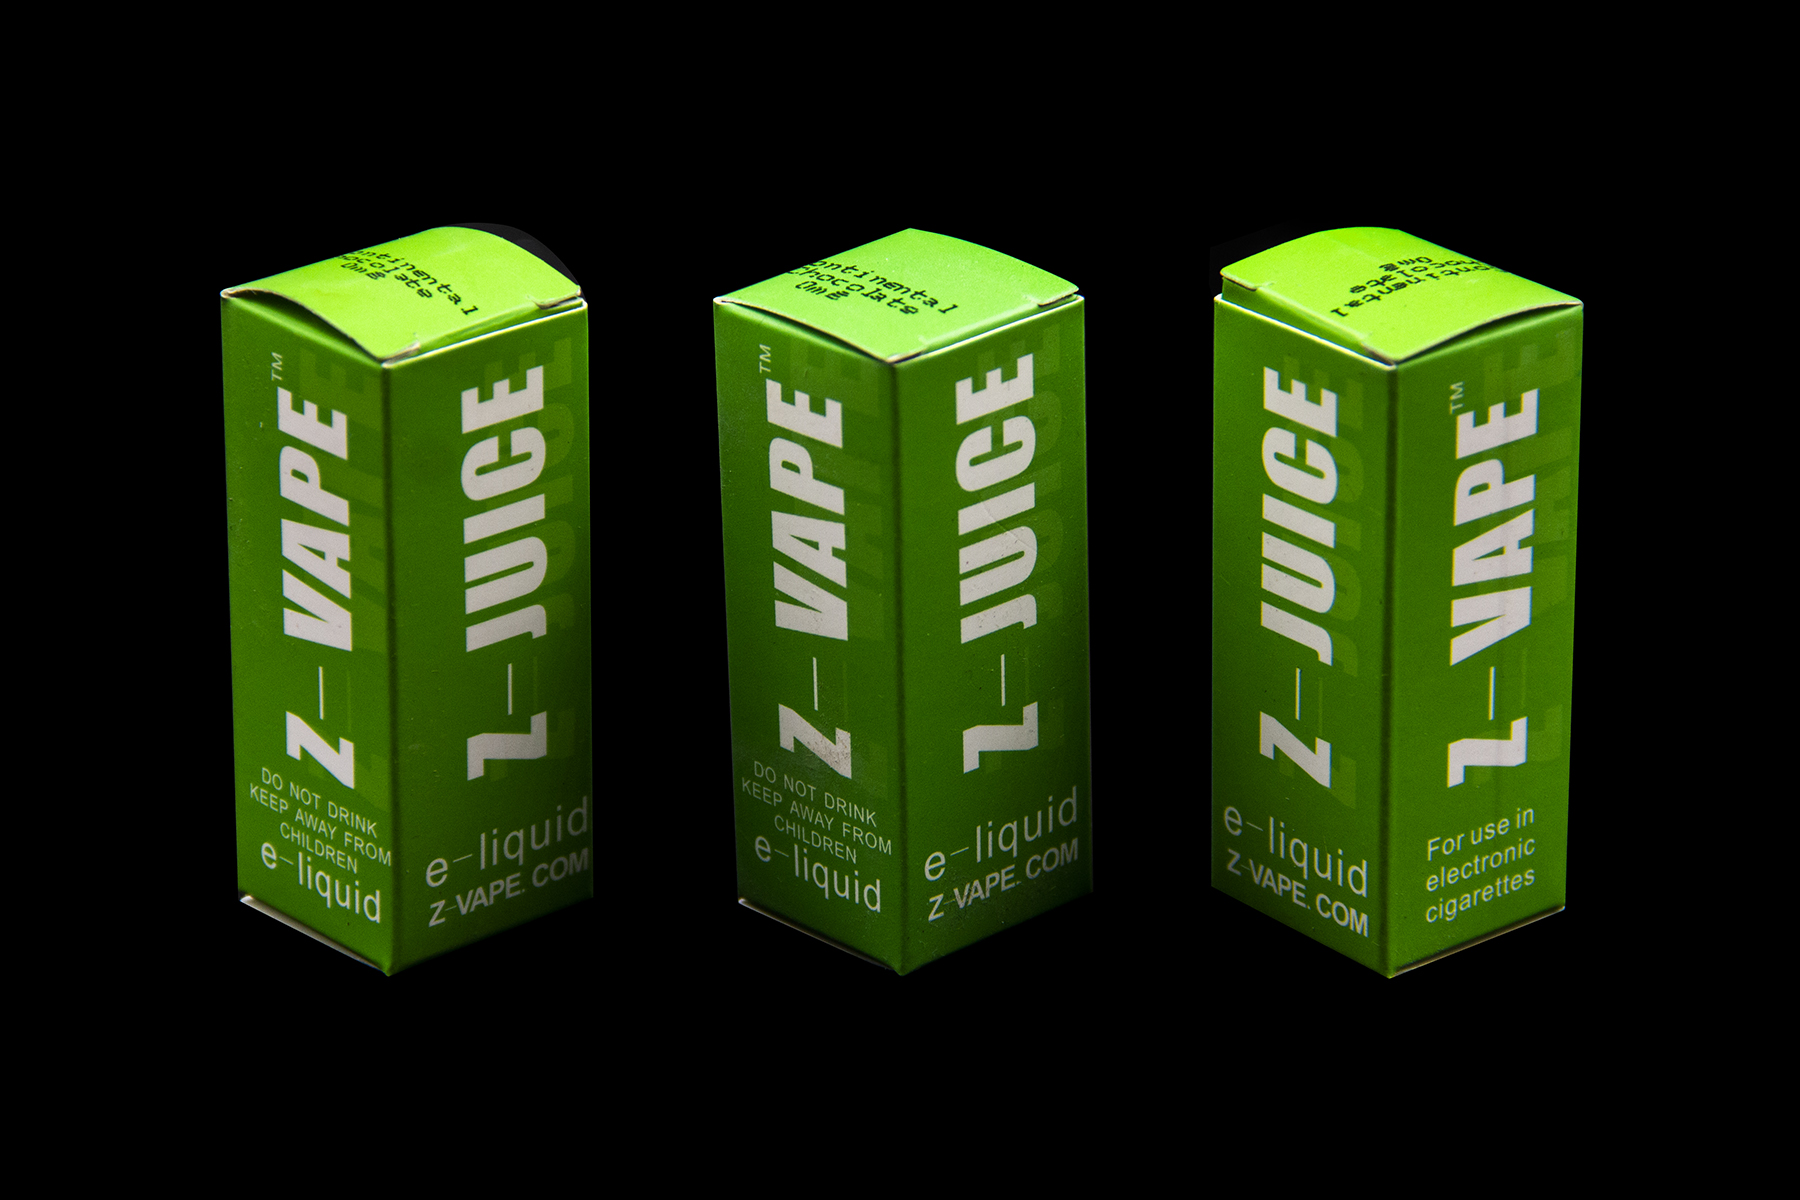 Z-Vape Liquid (E-Juice) mix and match